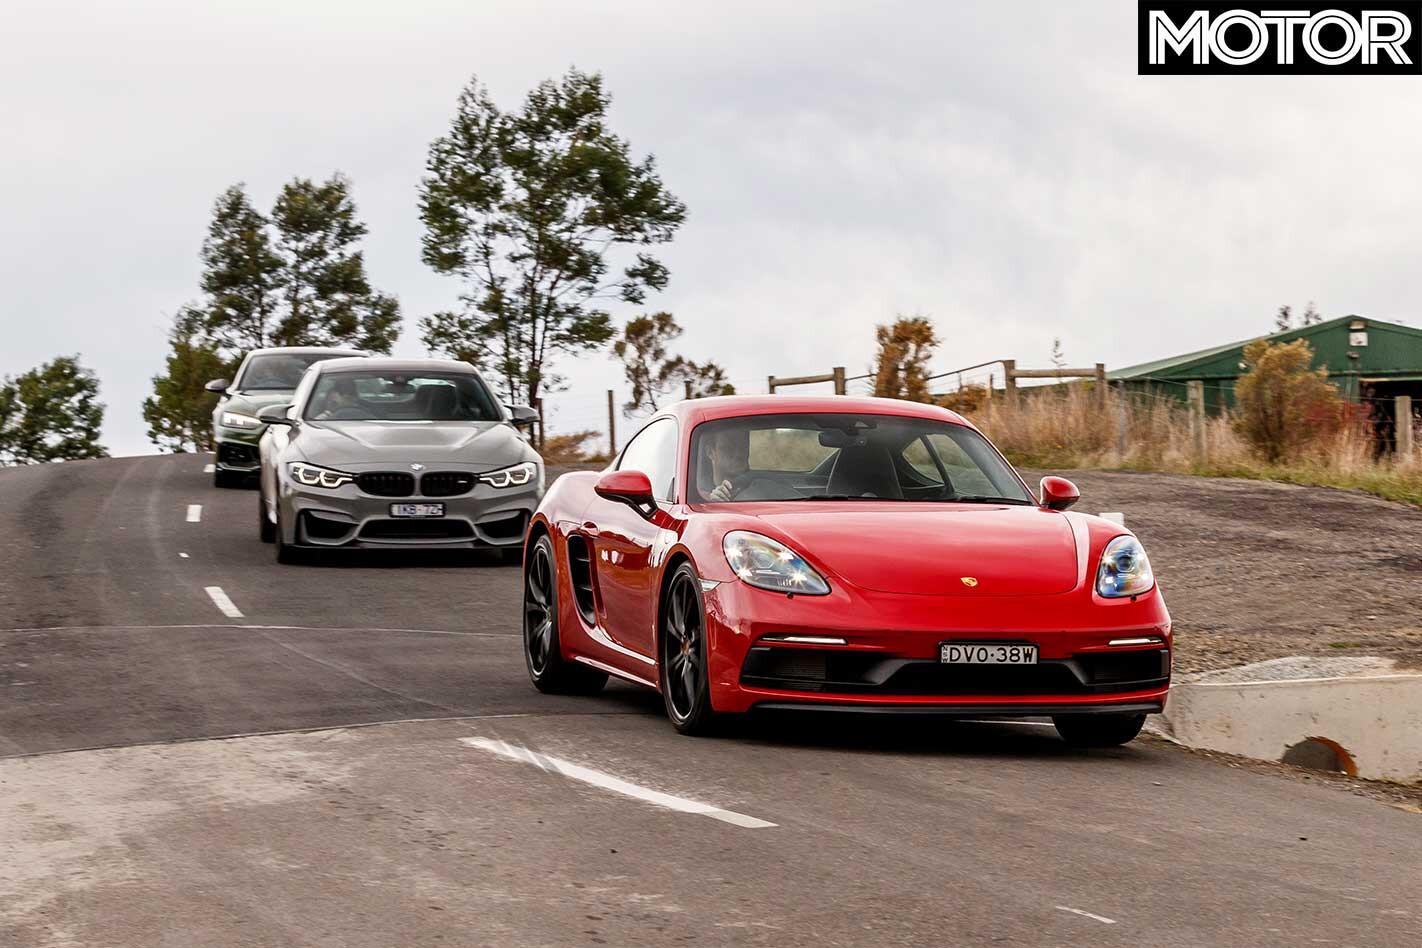 2018 Audi RS 5 V BMW M 4 CS V Porsche 718 Cayman GTS Comparison Results Jpg